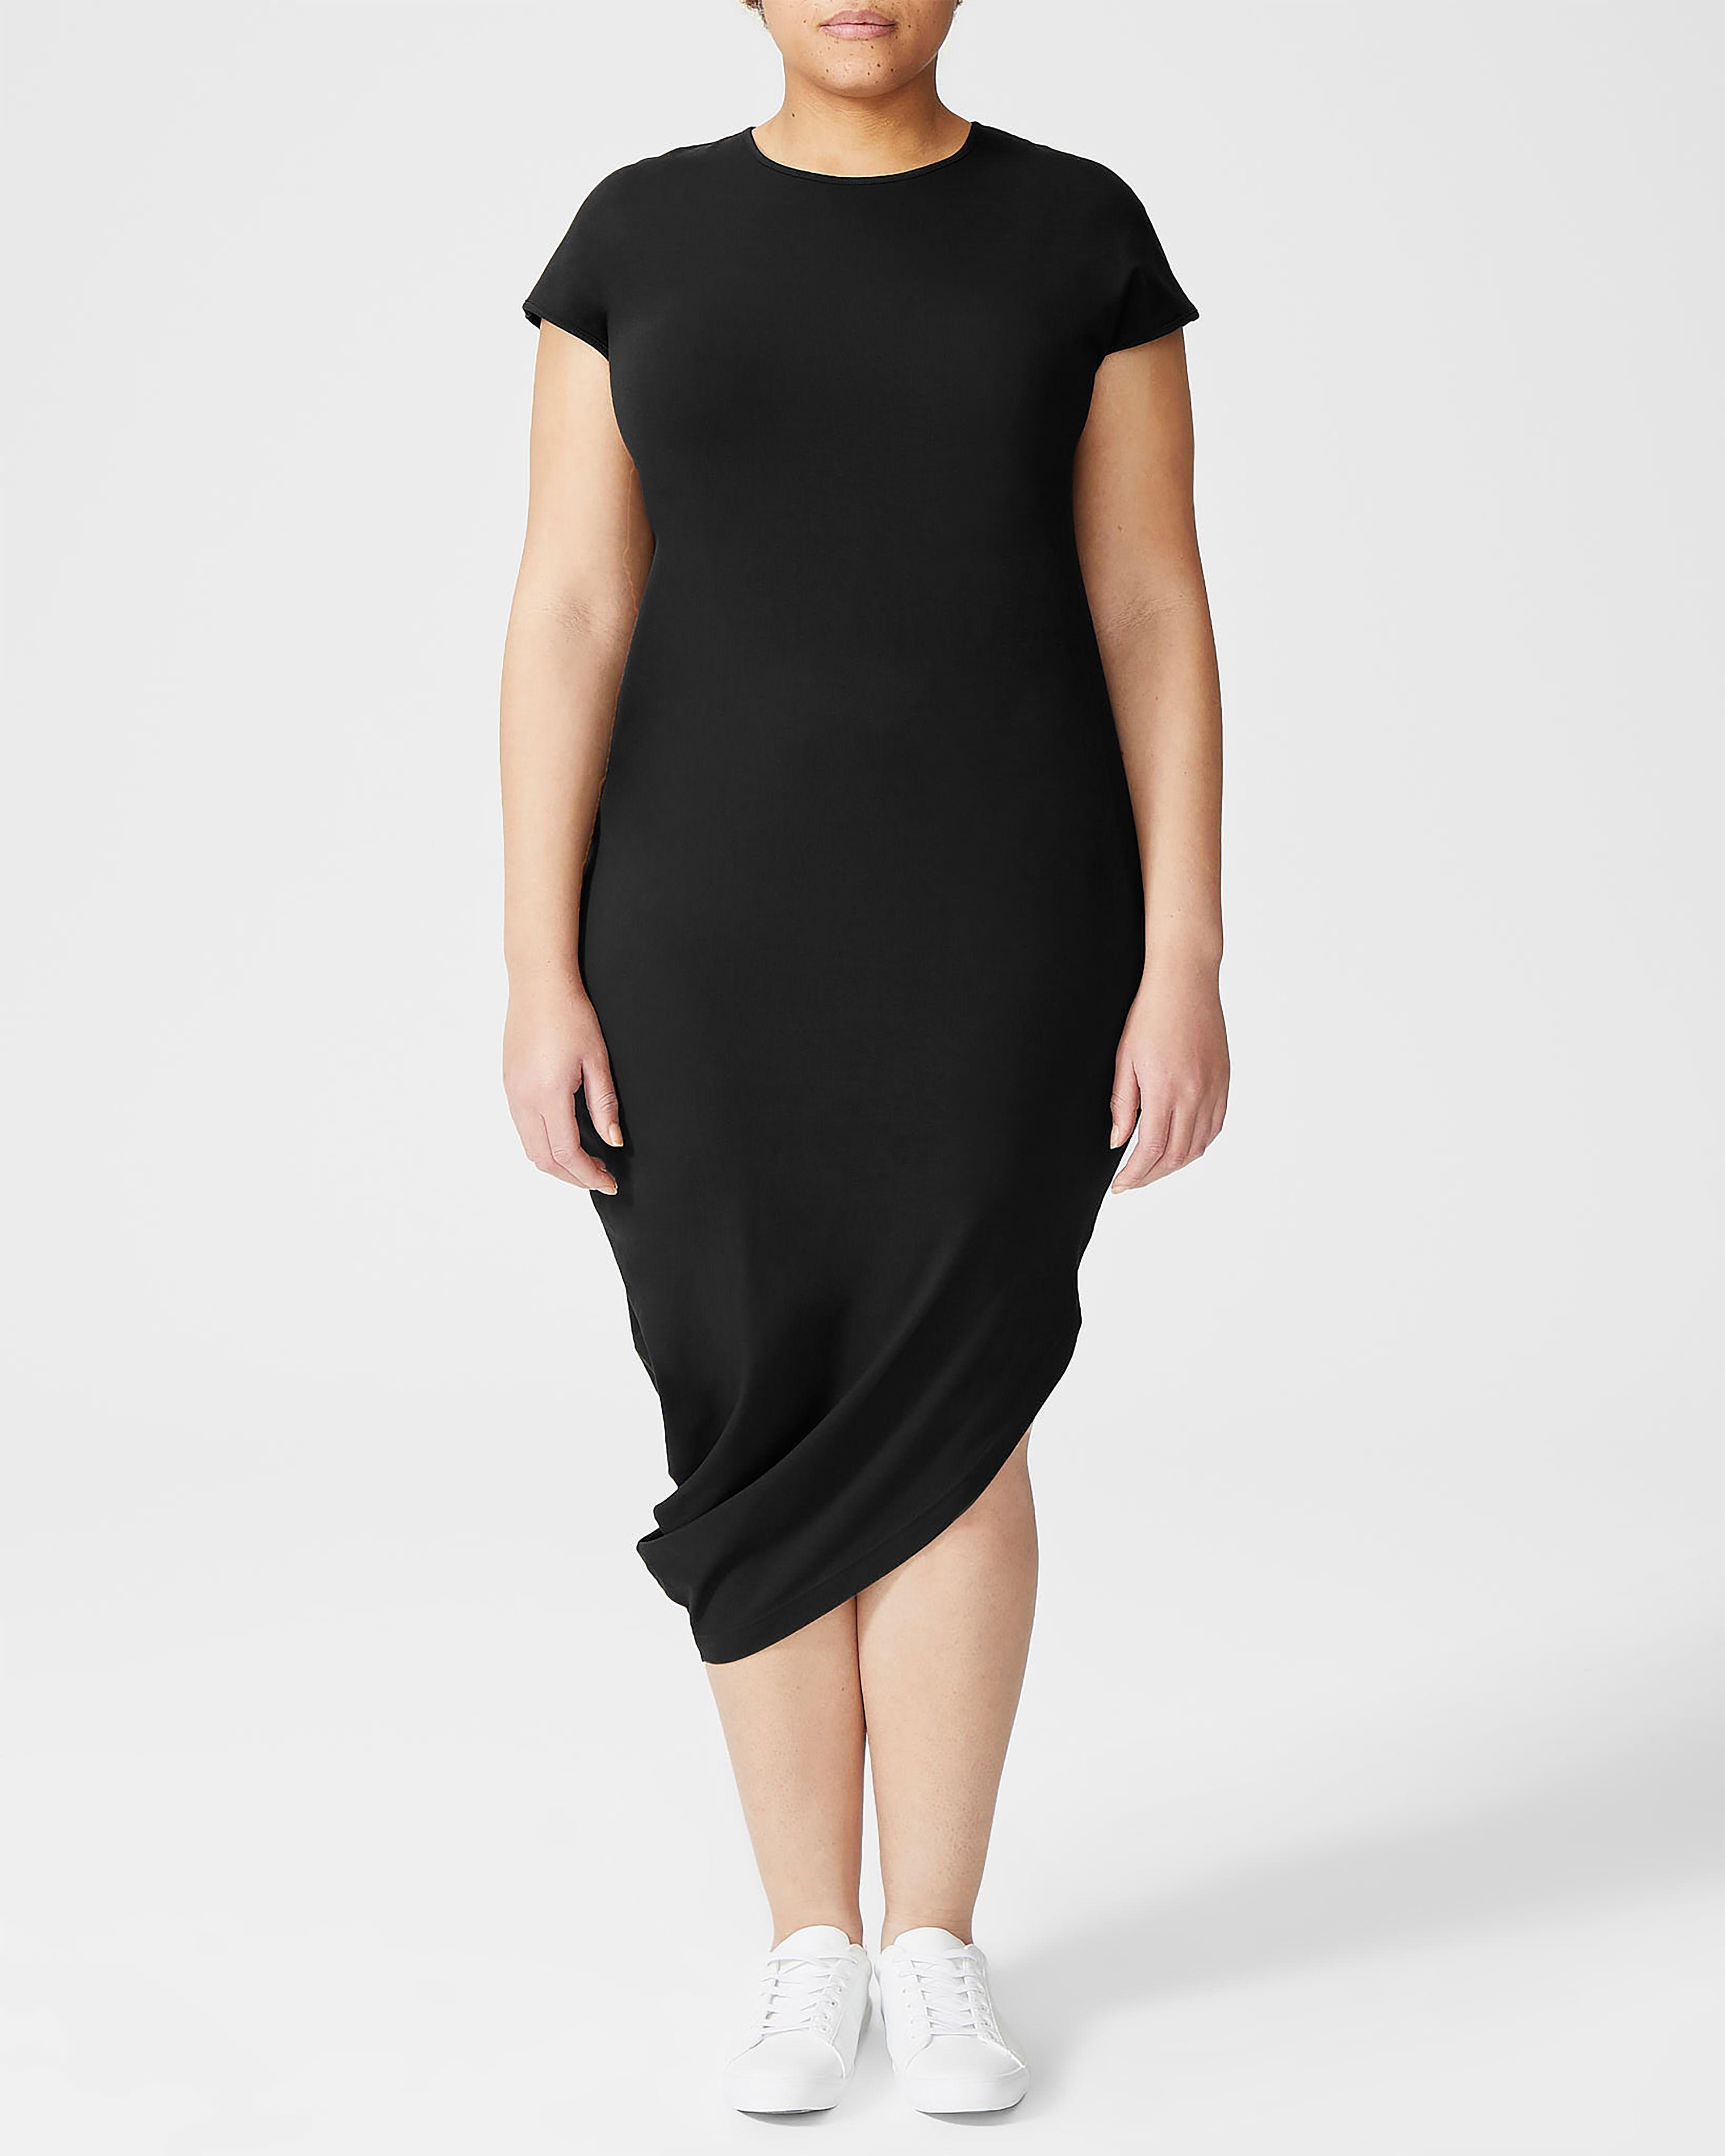 Iconic Geneva Dress - Black